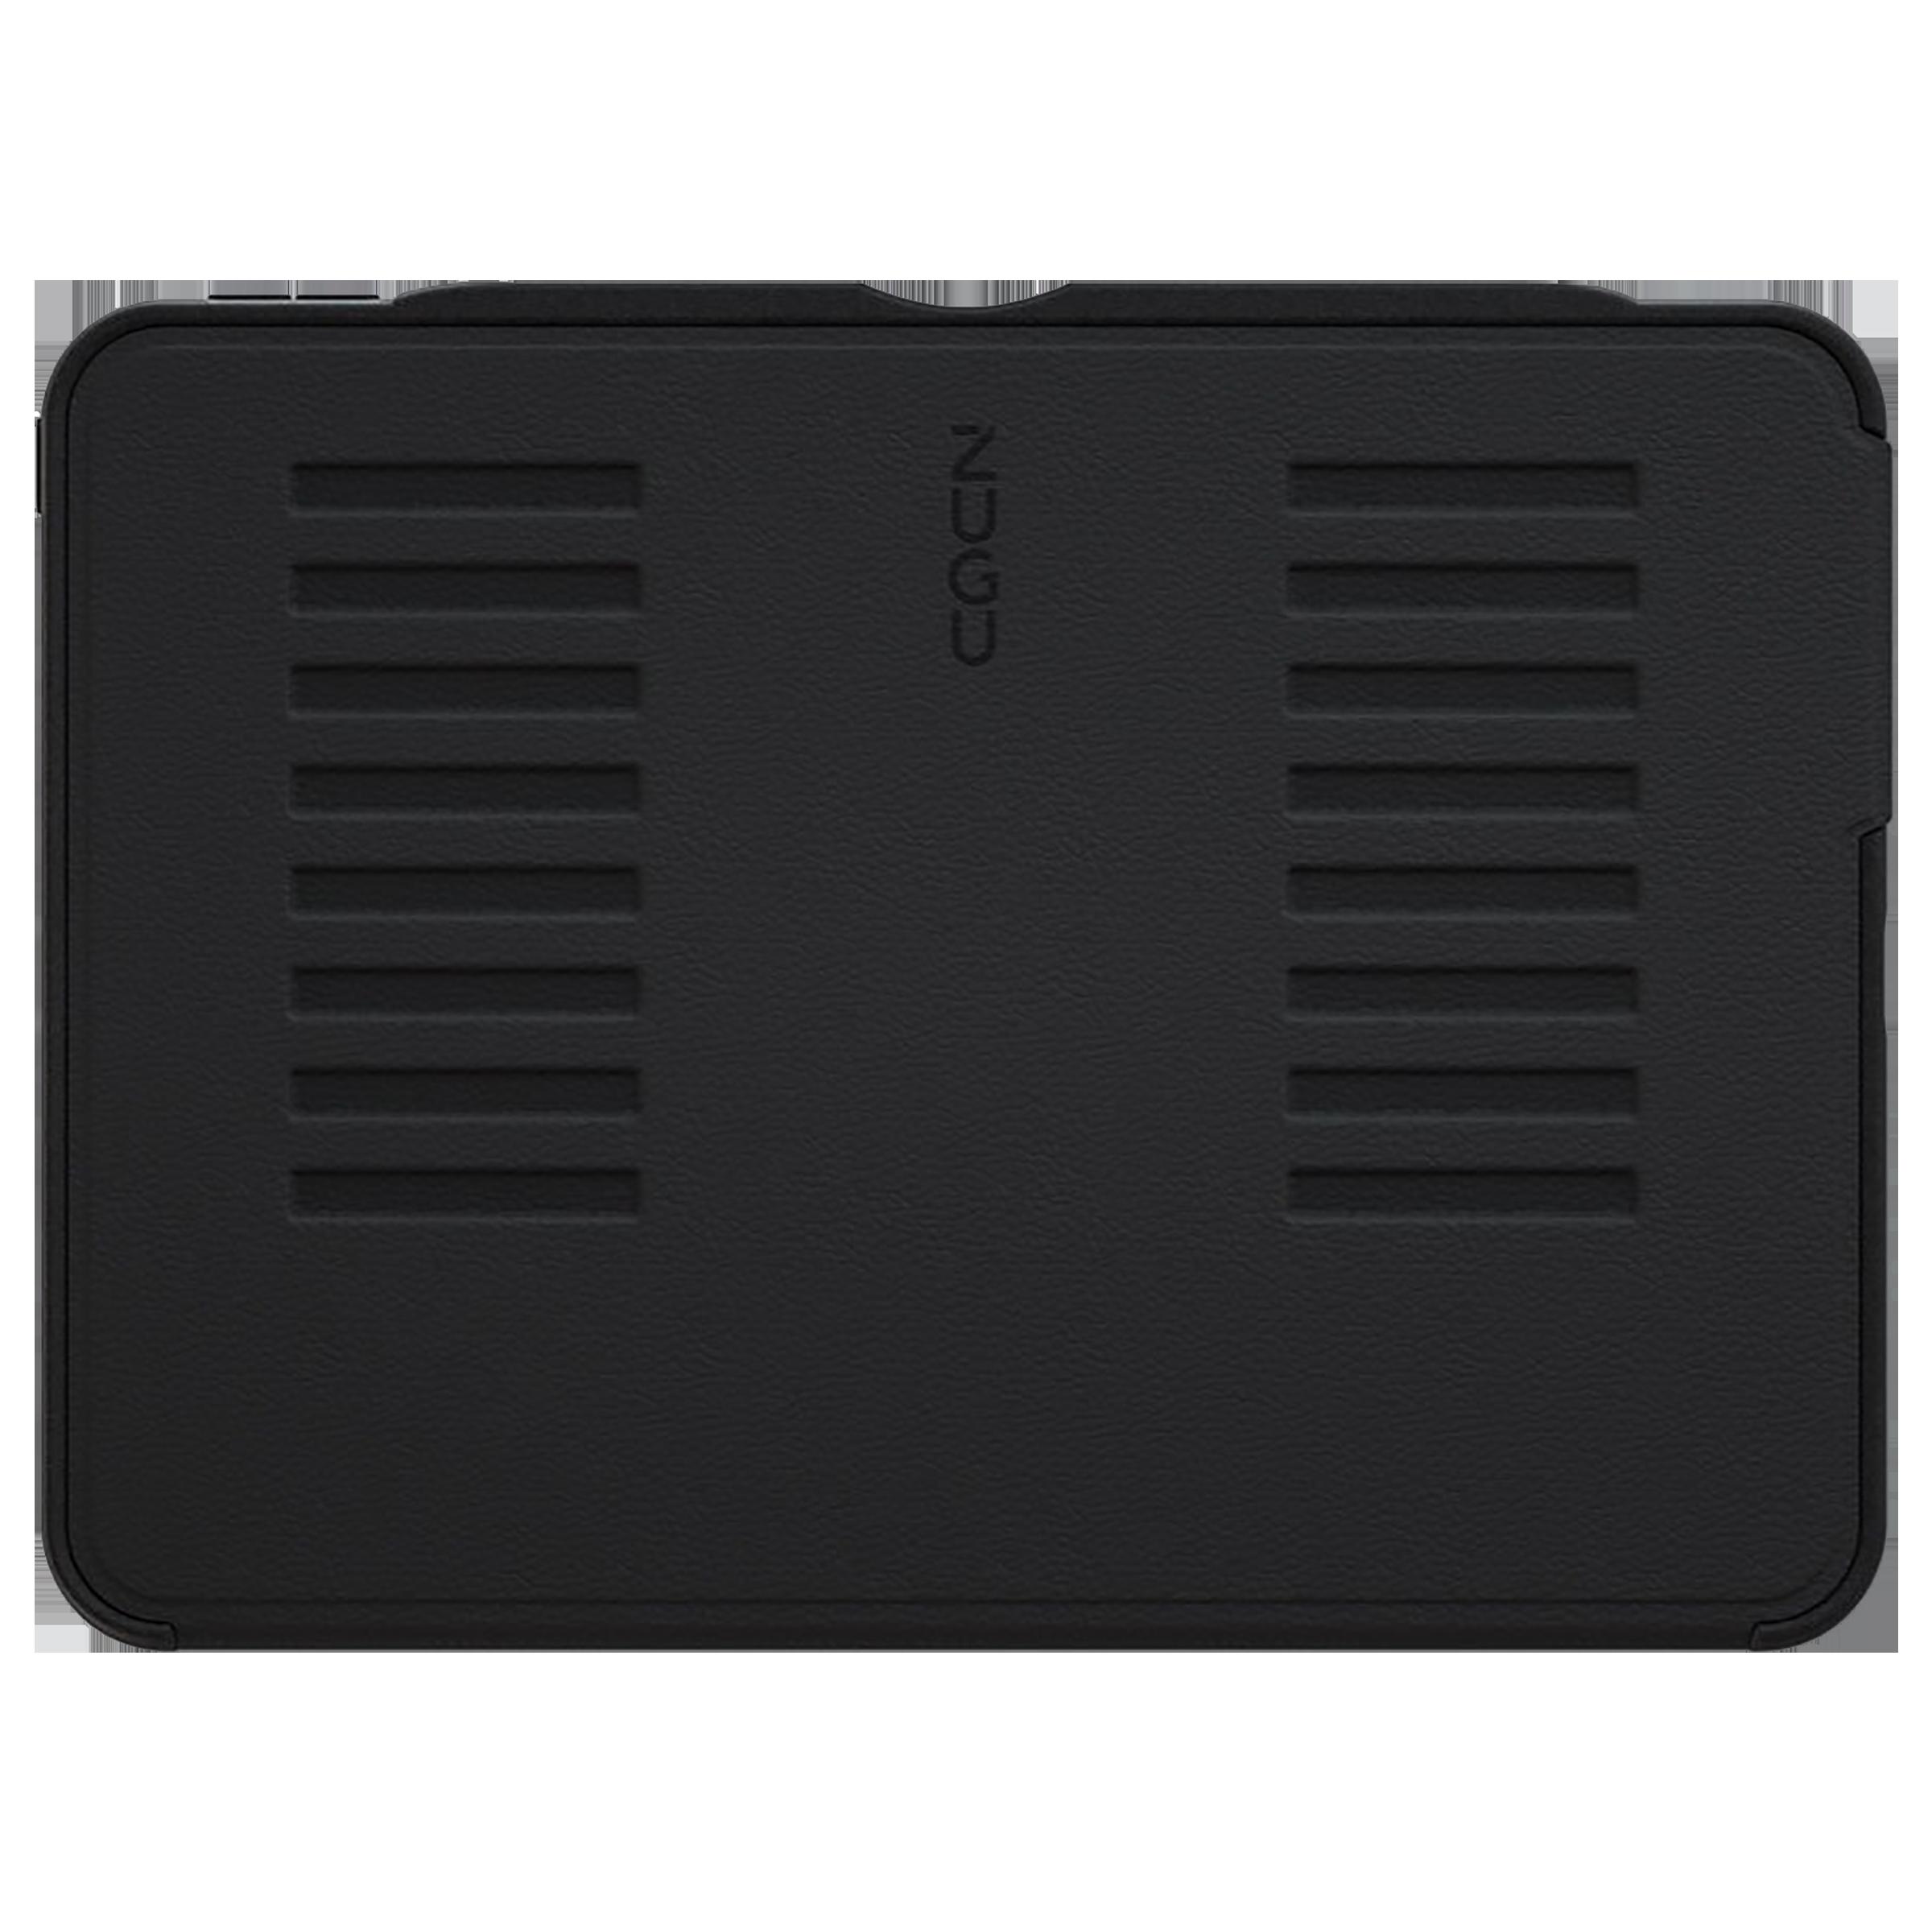 Zugu Microfiber Flip Case with Stand For Apple iPad Pro 12.9 Inch (Robust Bumper & Rugged TPU, ZG-21-129BLK, Black)_1